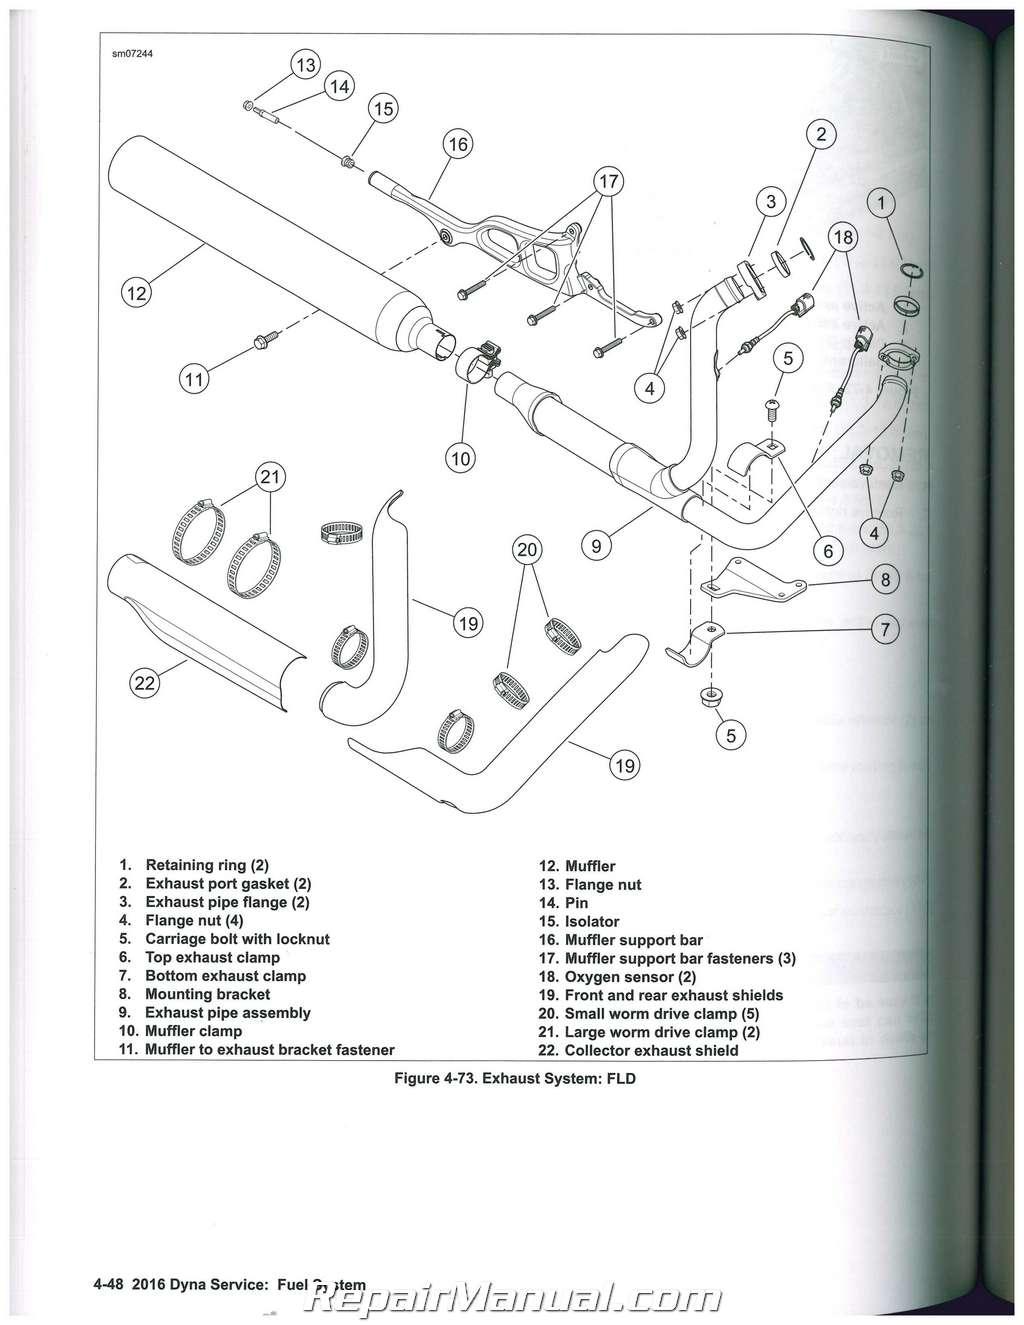 2016 harley davidson dyna motorcycle service manualharley davidson exhaust  diagram #17